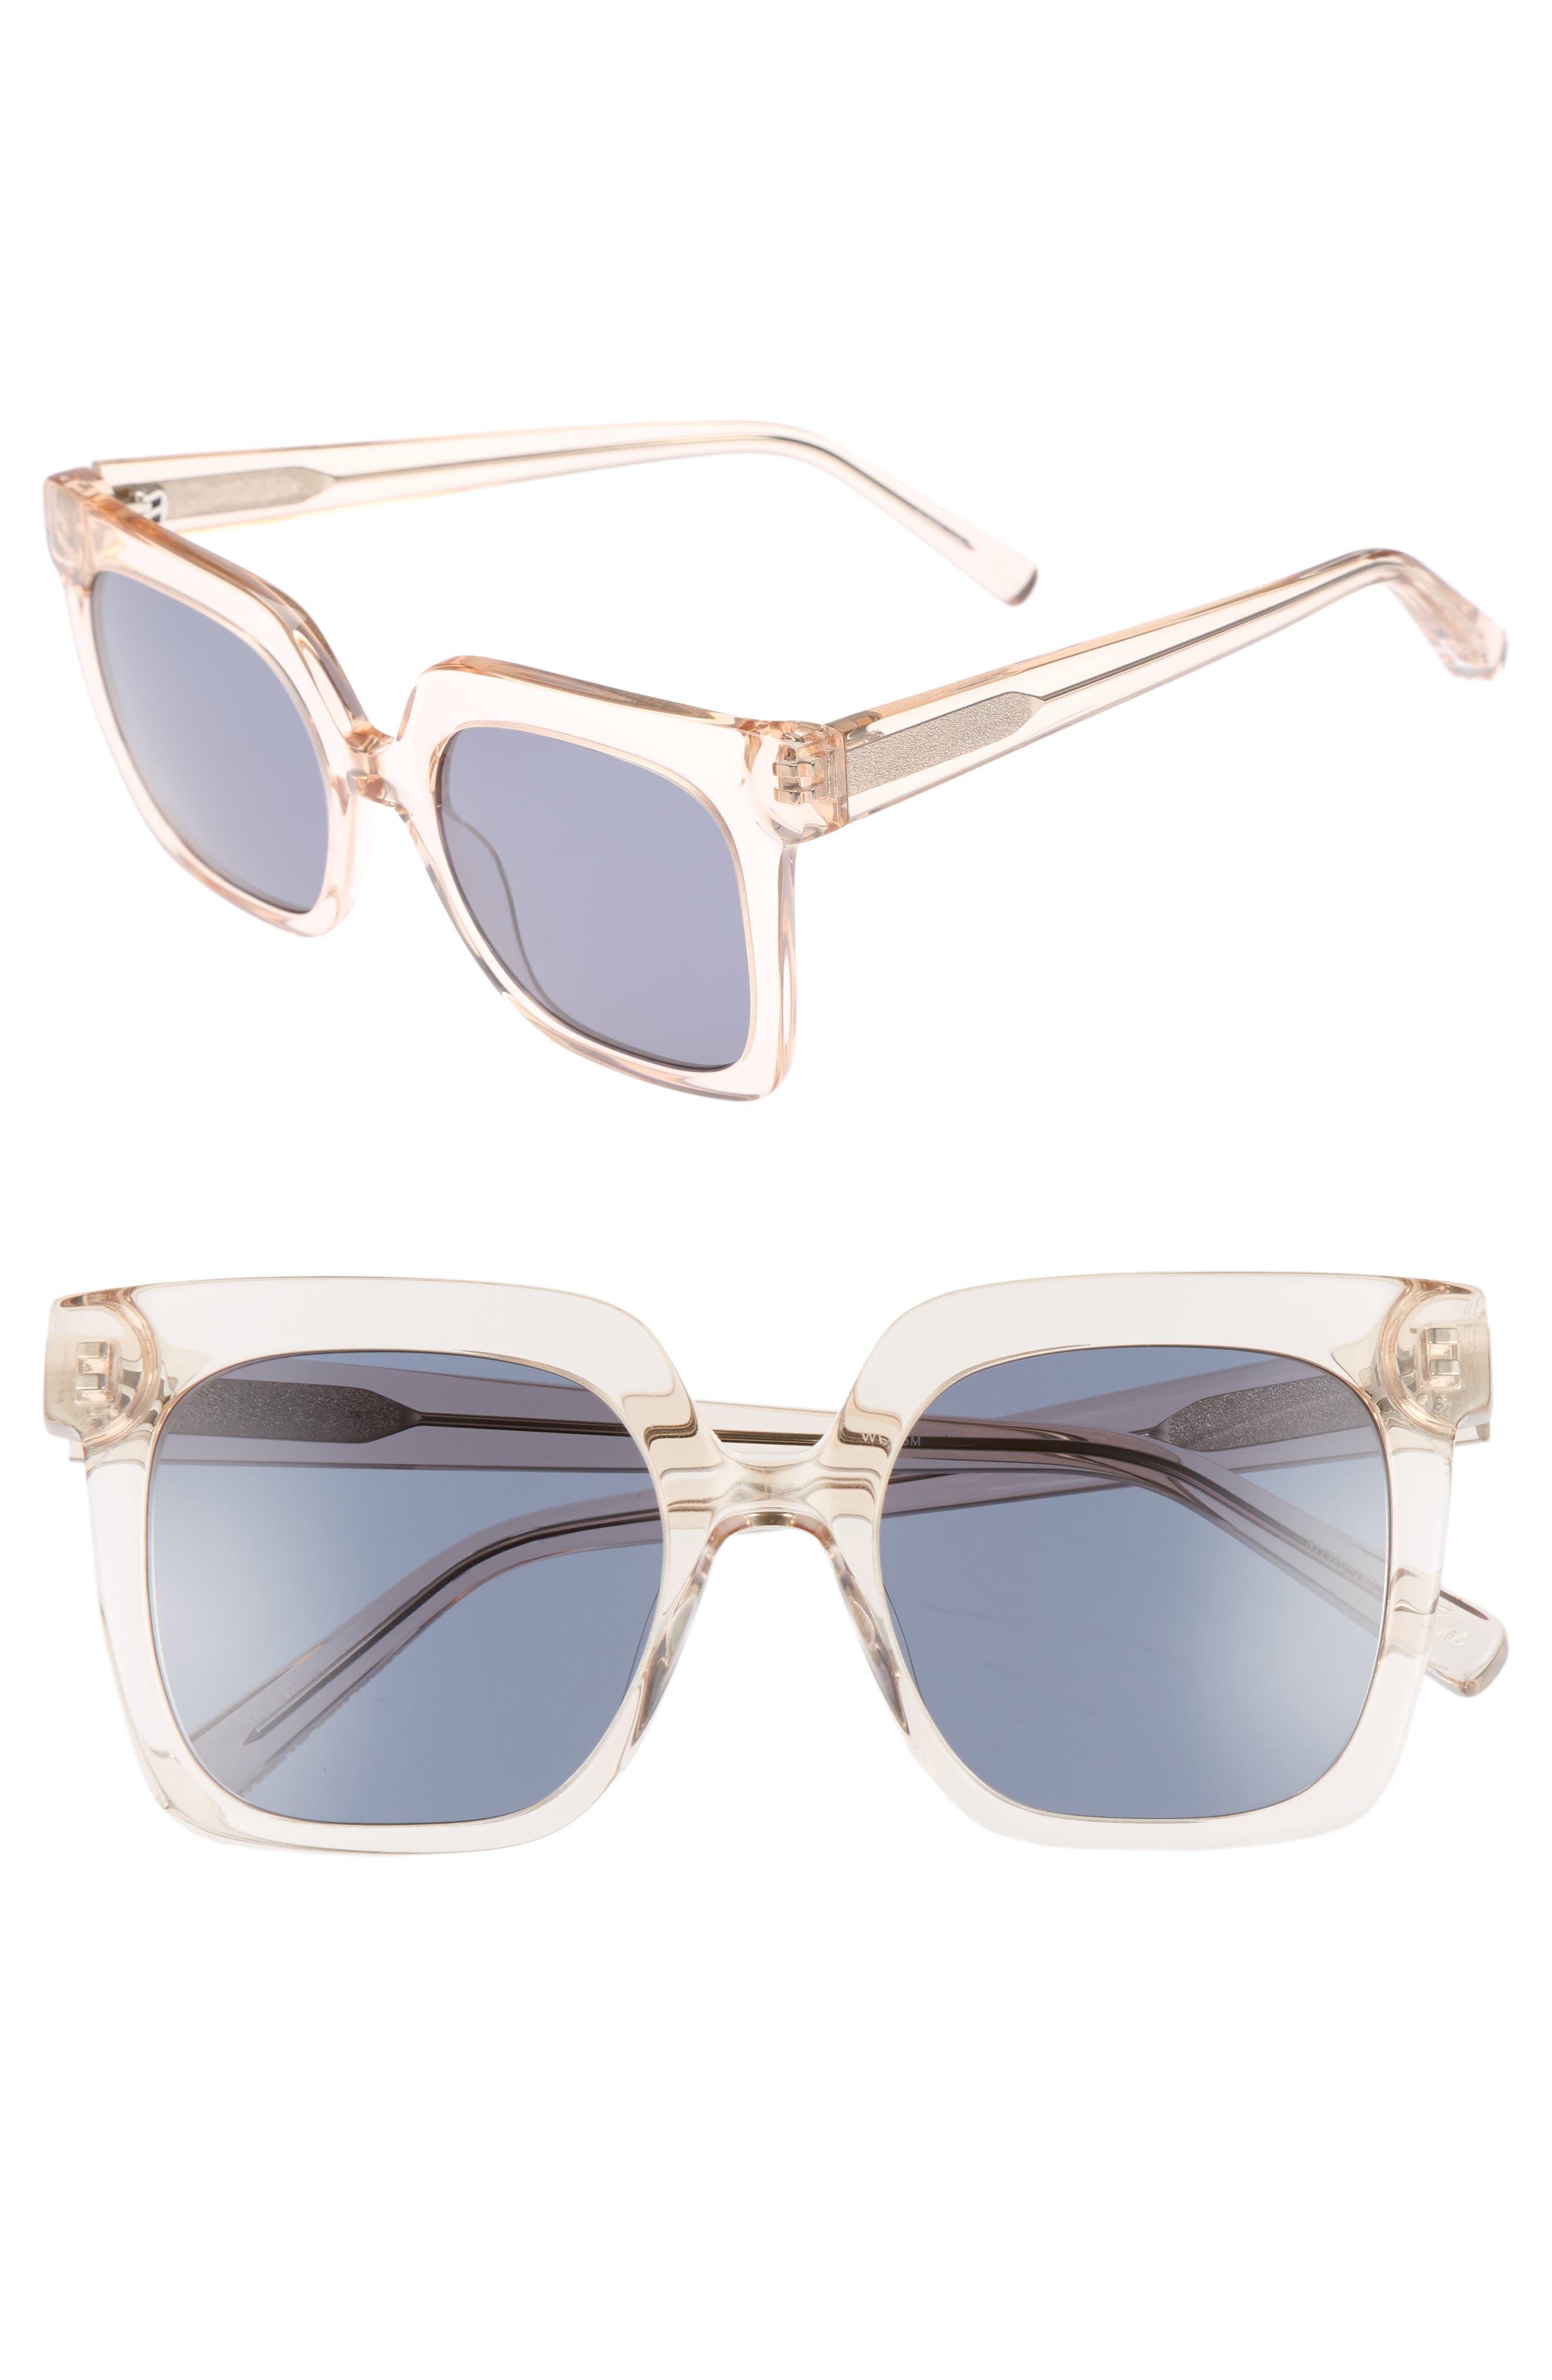 Rae 51mm Square Sunglasses,                             Main thumbnail 1, color,                             Crystal Tea